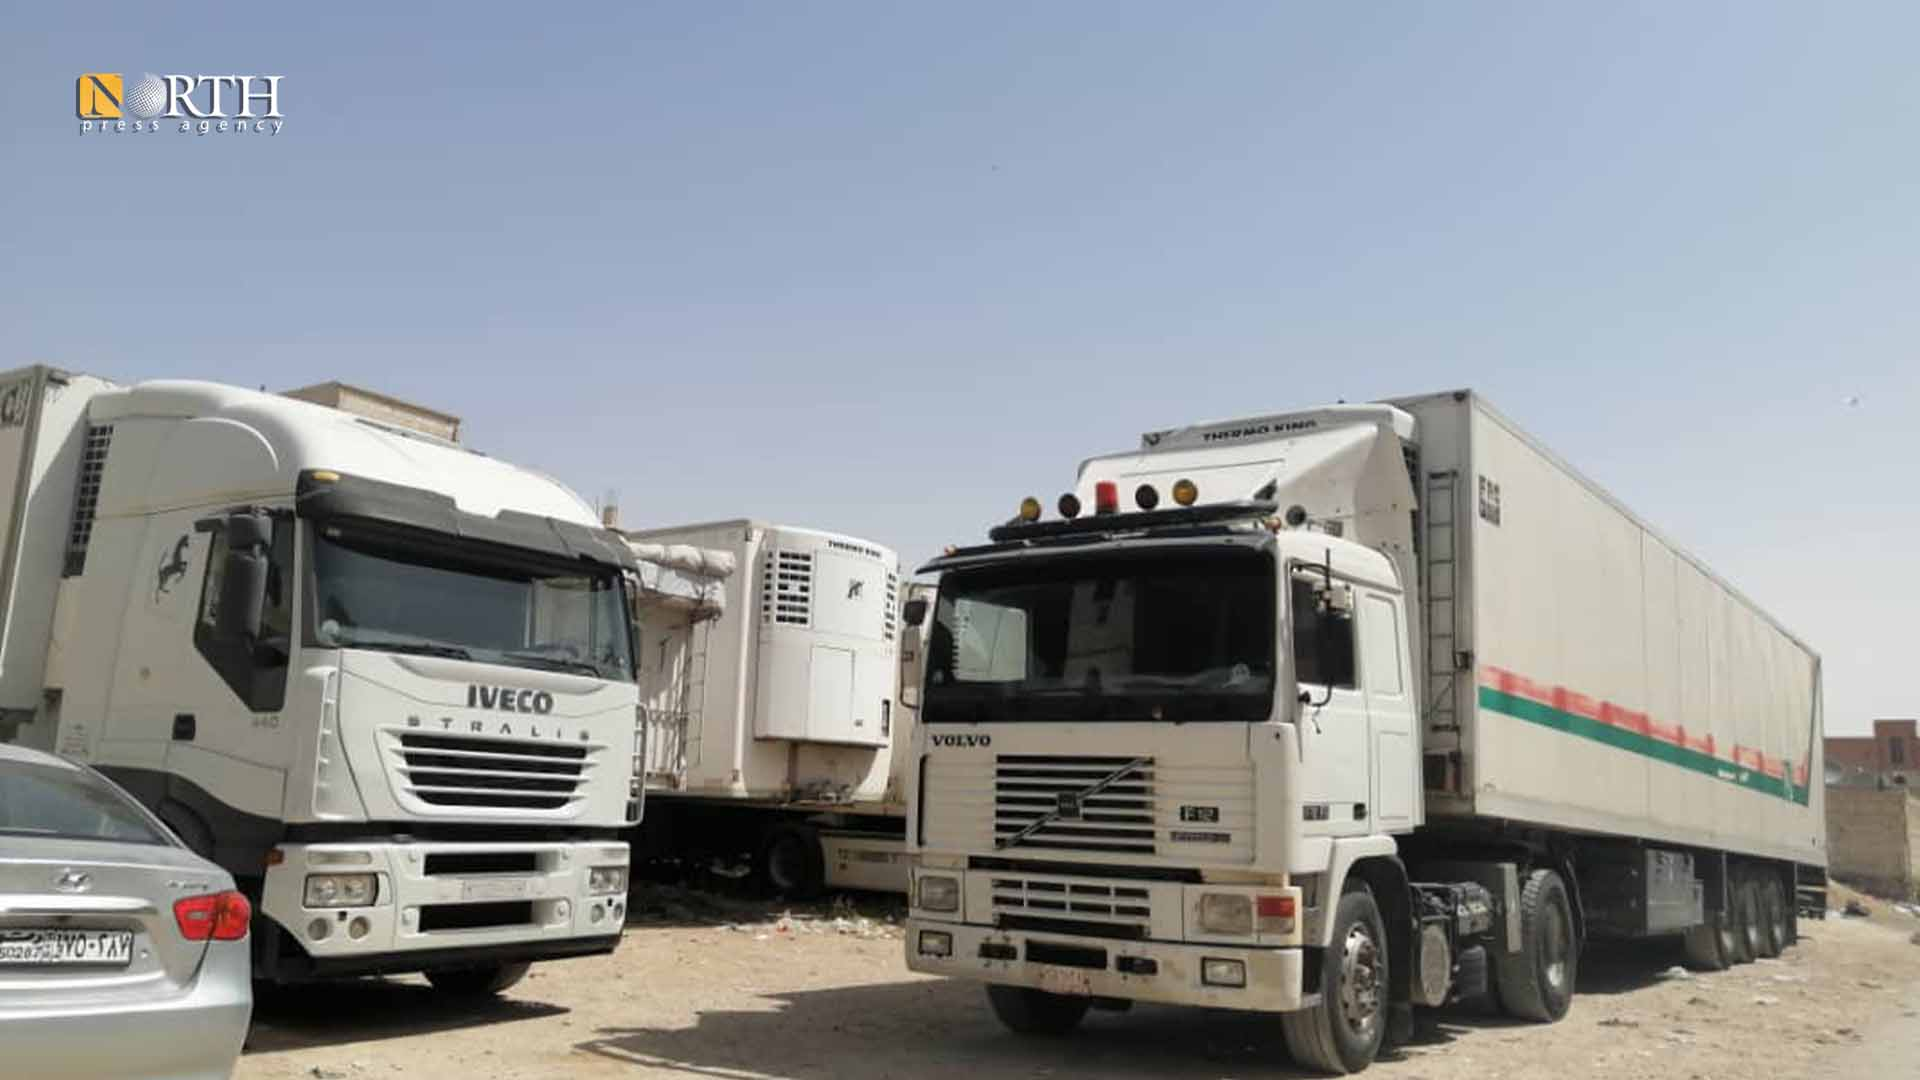 Syrian cargo cars waiting on Nasib crossing – North Press.